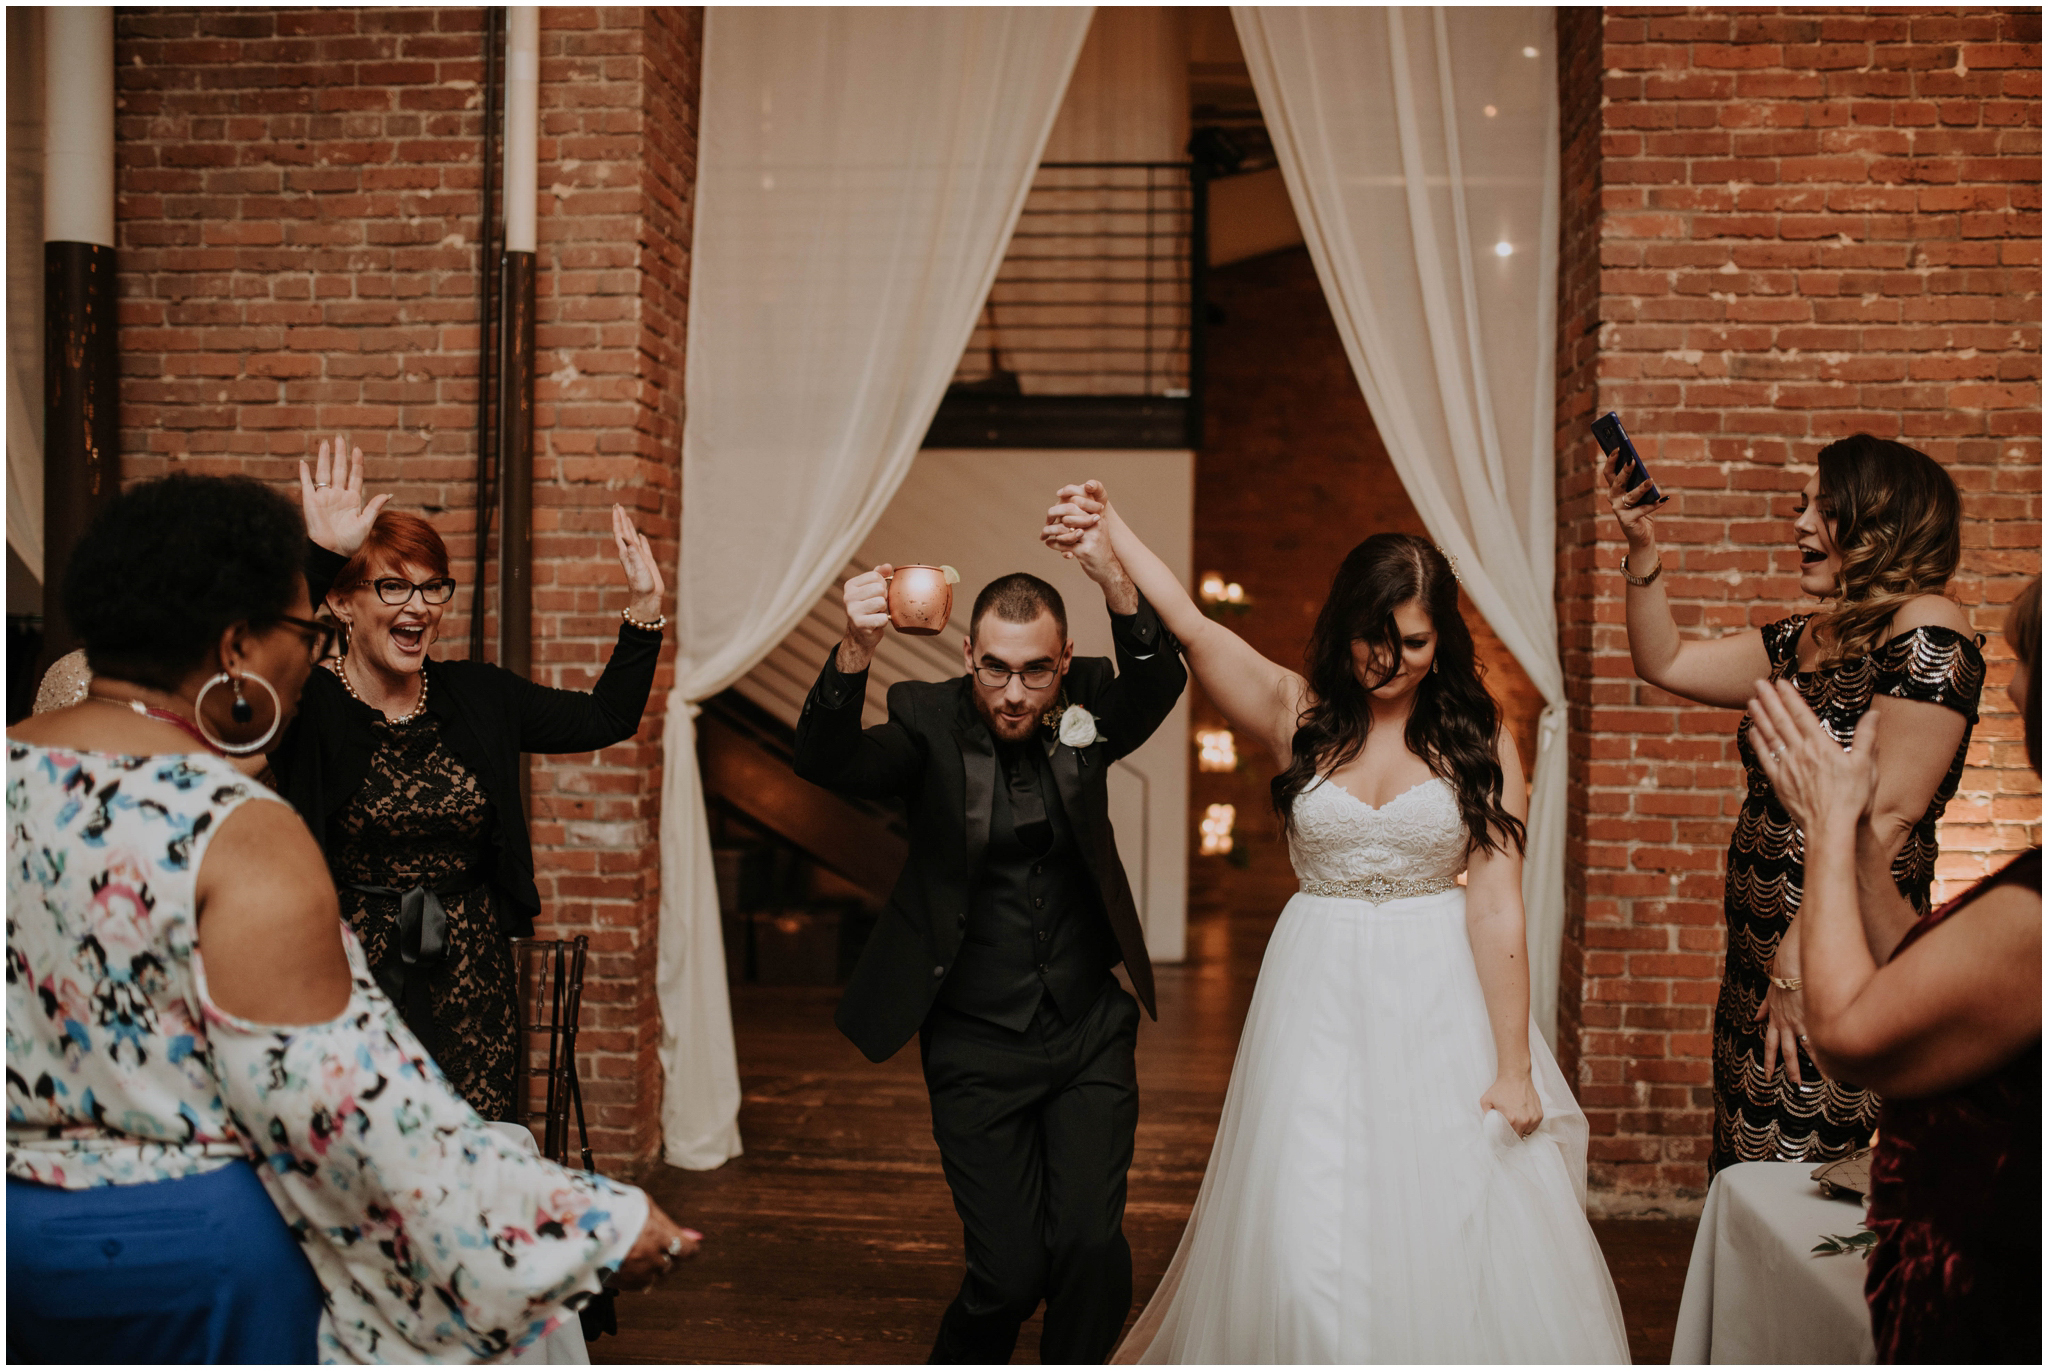 danny+mackenzie+downtown-seattle-axis-wedding-seattle-photographer-102.jpg